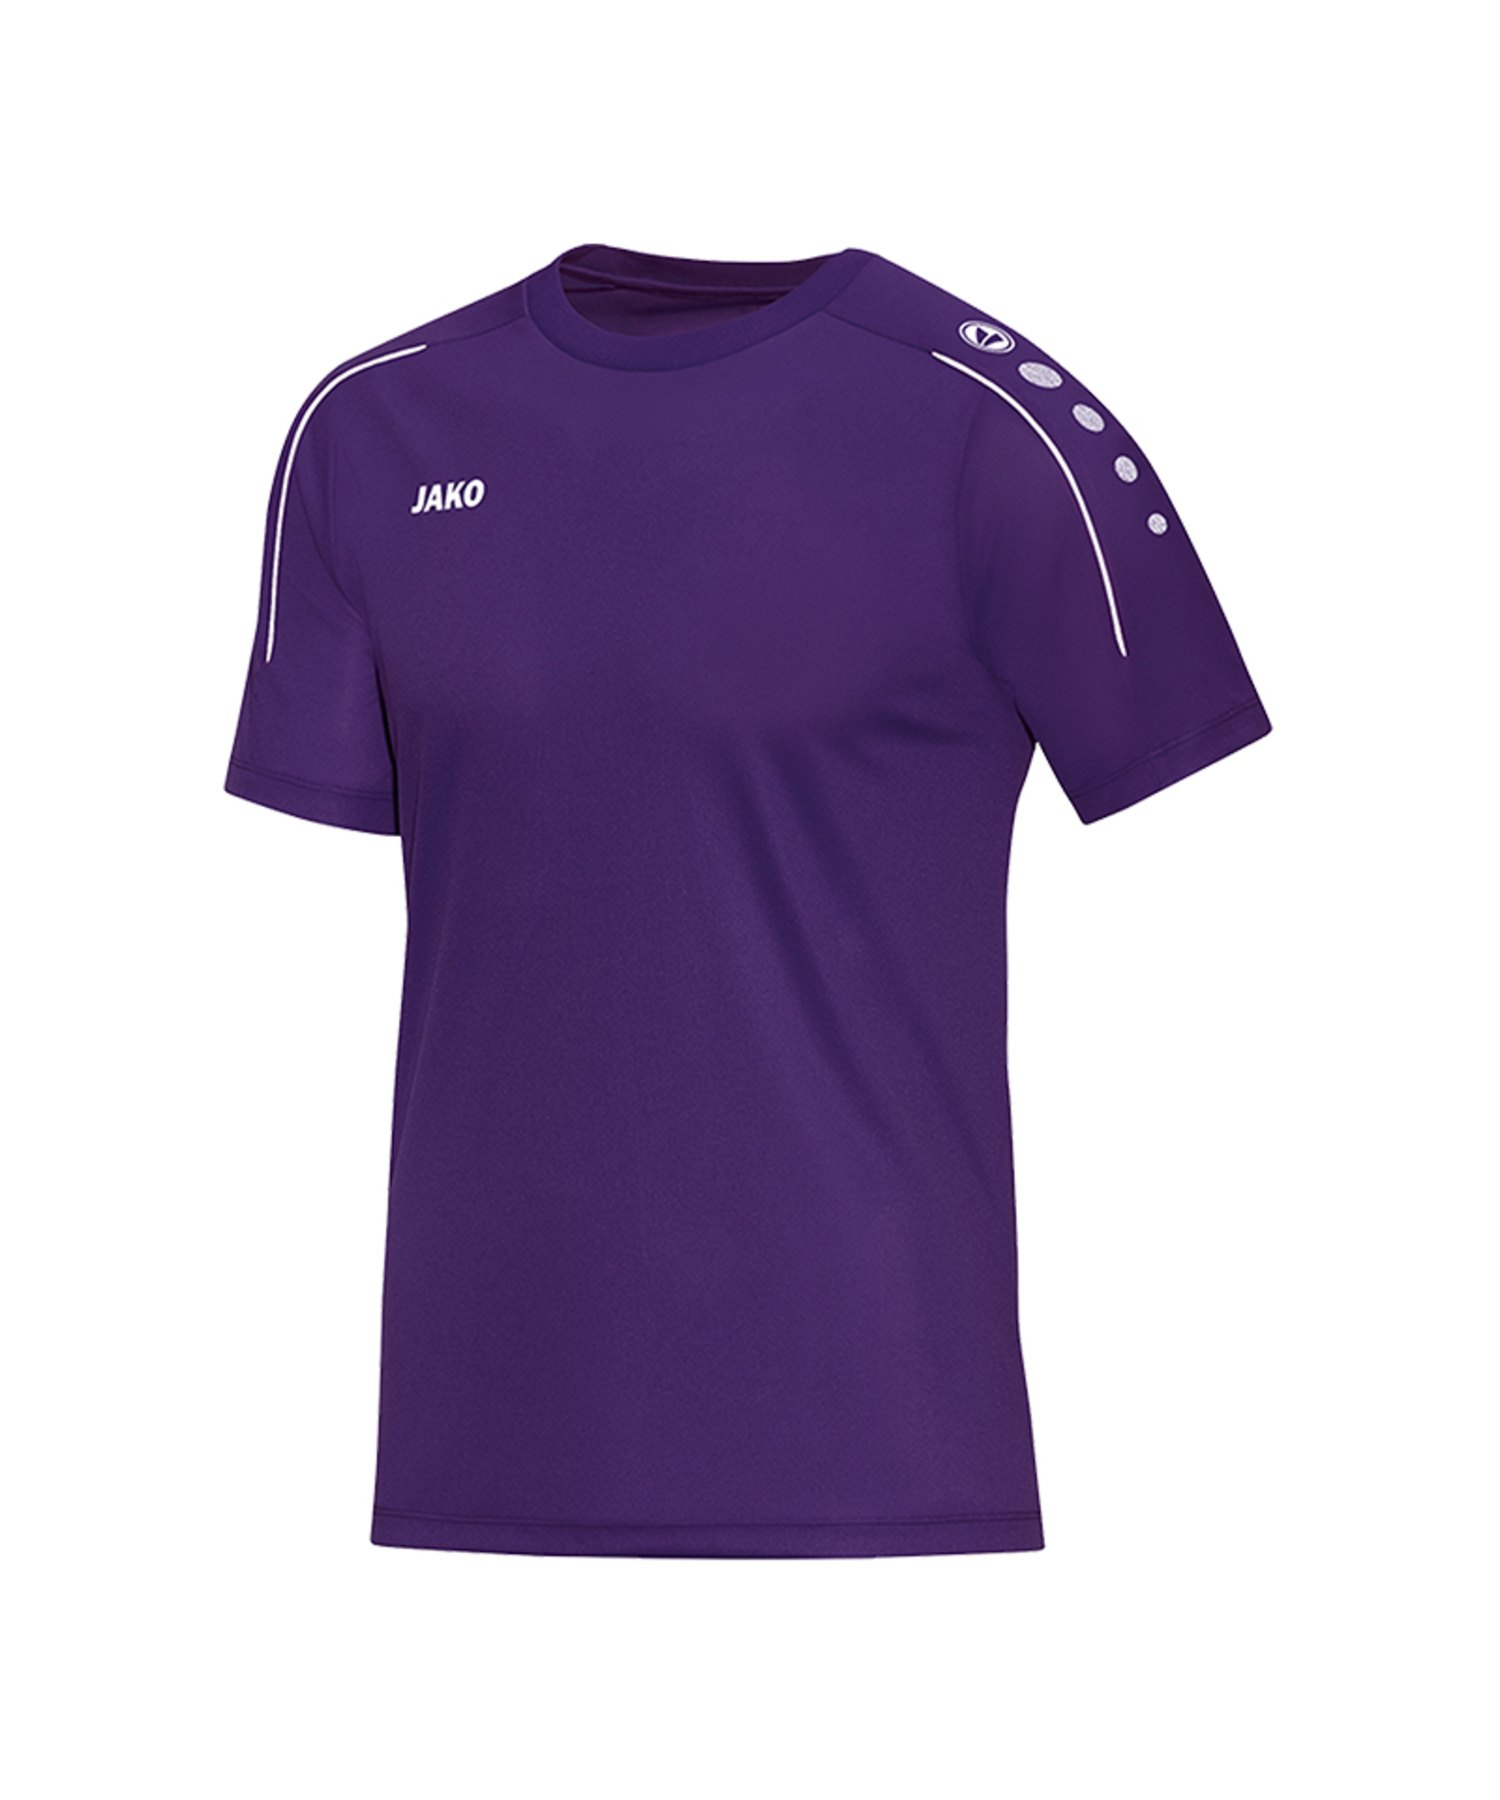 Jako Classico T-Shirt Kids Lila F10 - Lila